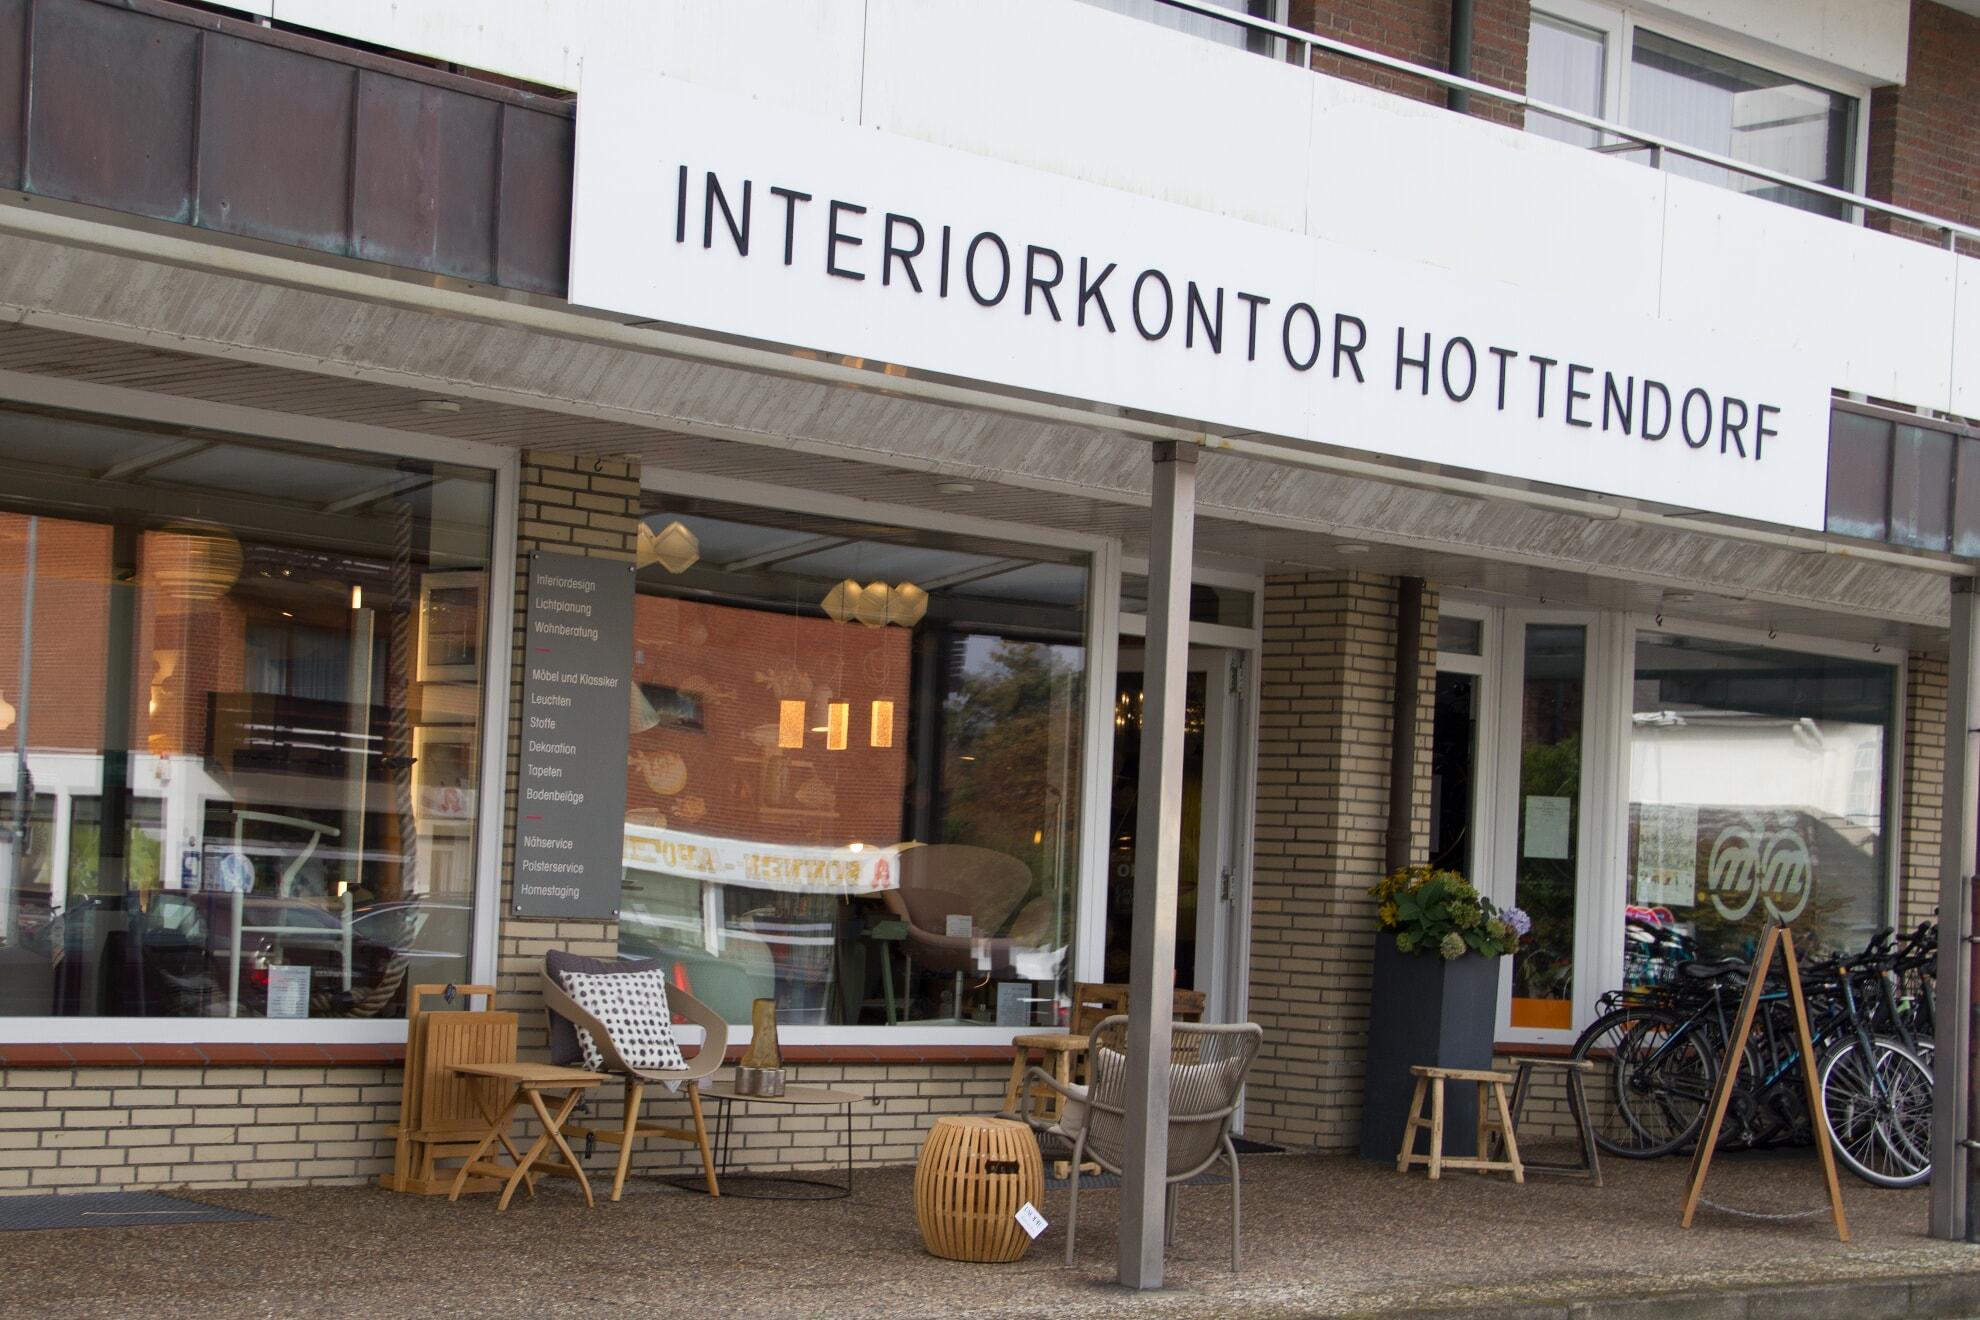 Interiorkontor Hottendorf